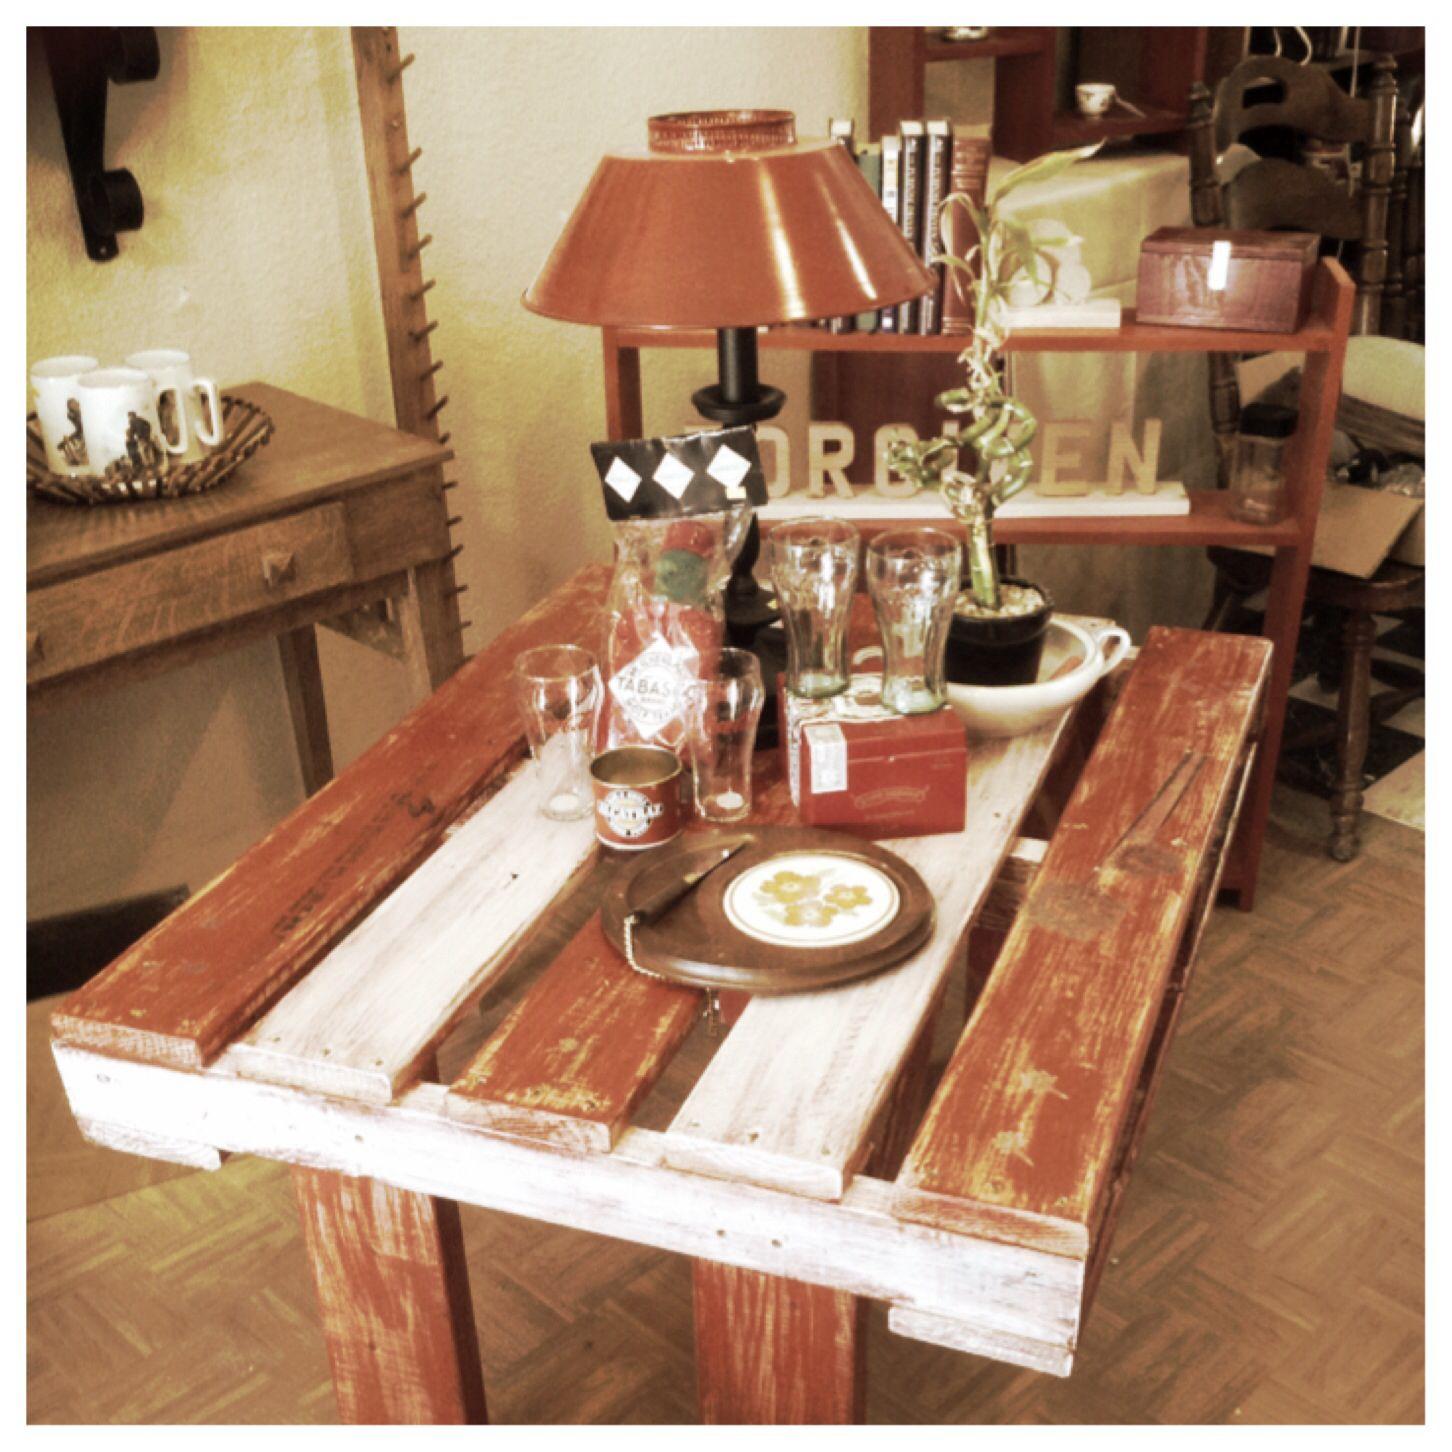 Pallet Patio Table Shop display